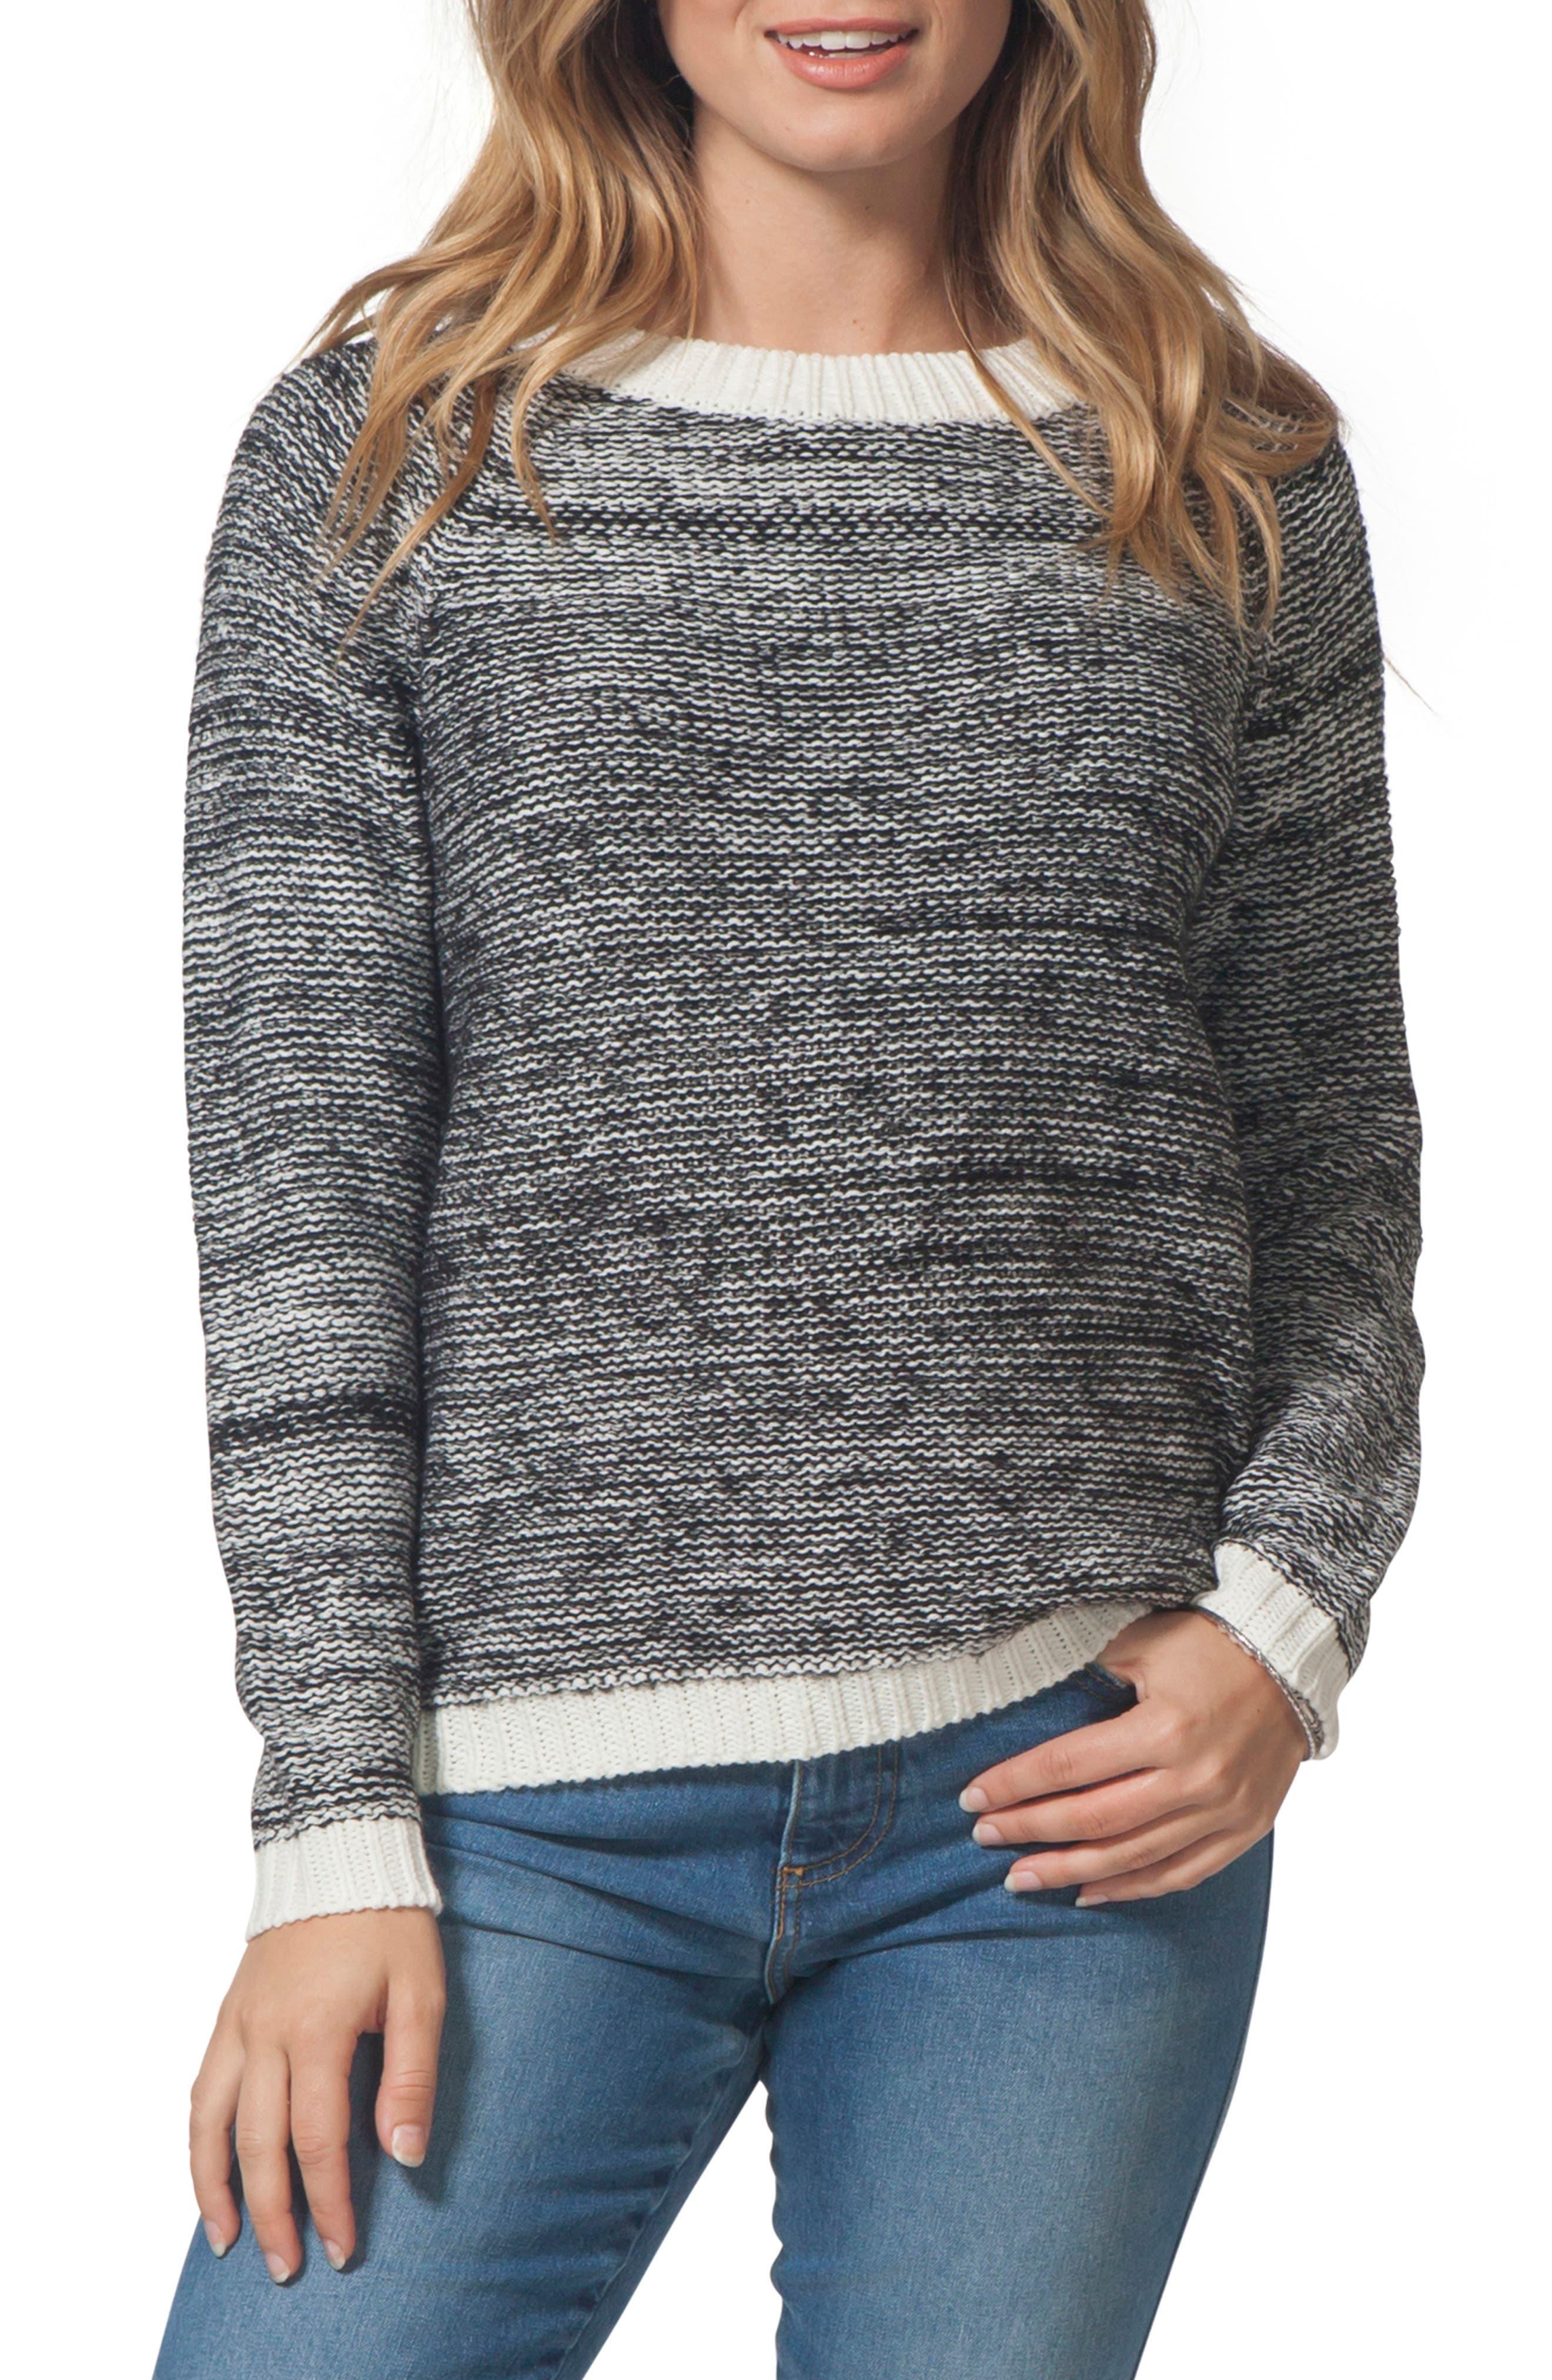 Beachside Crewneck Sweater,                         Main,                         color, CASTOR GRAY